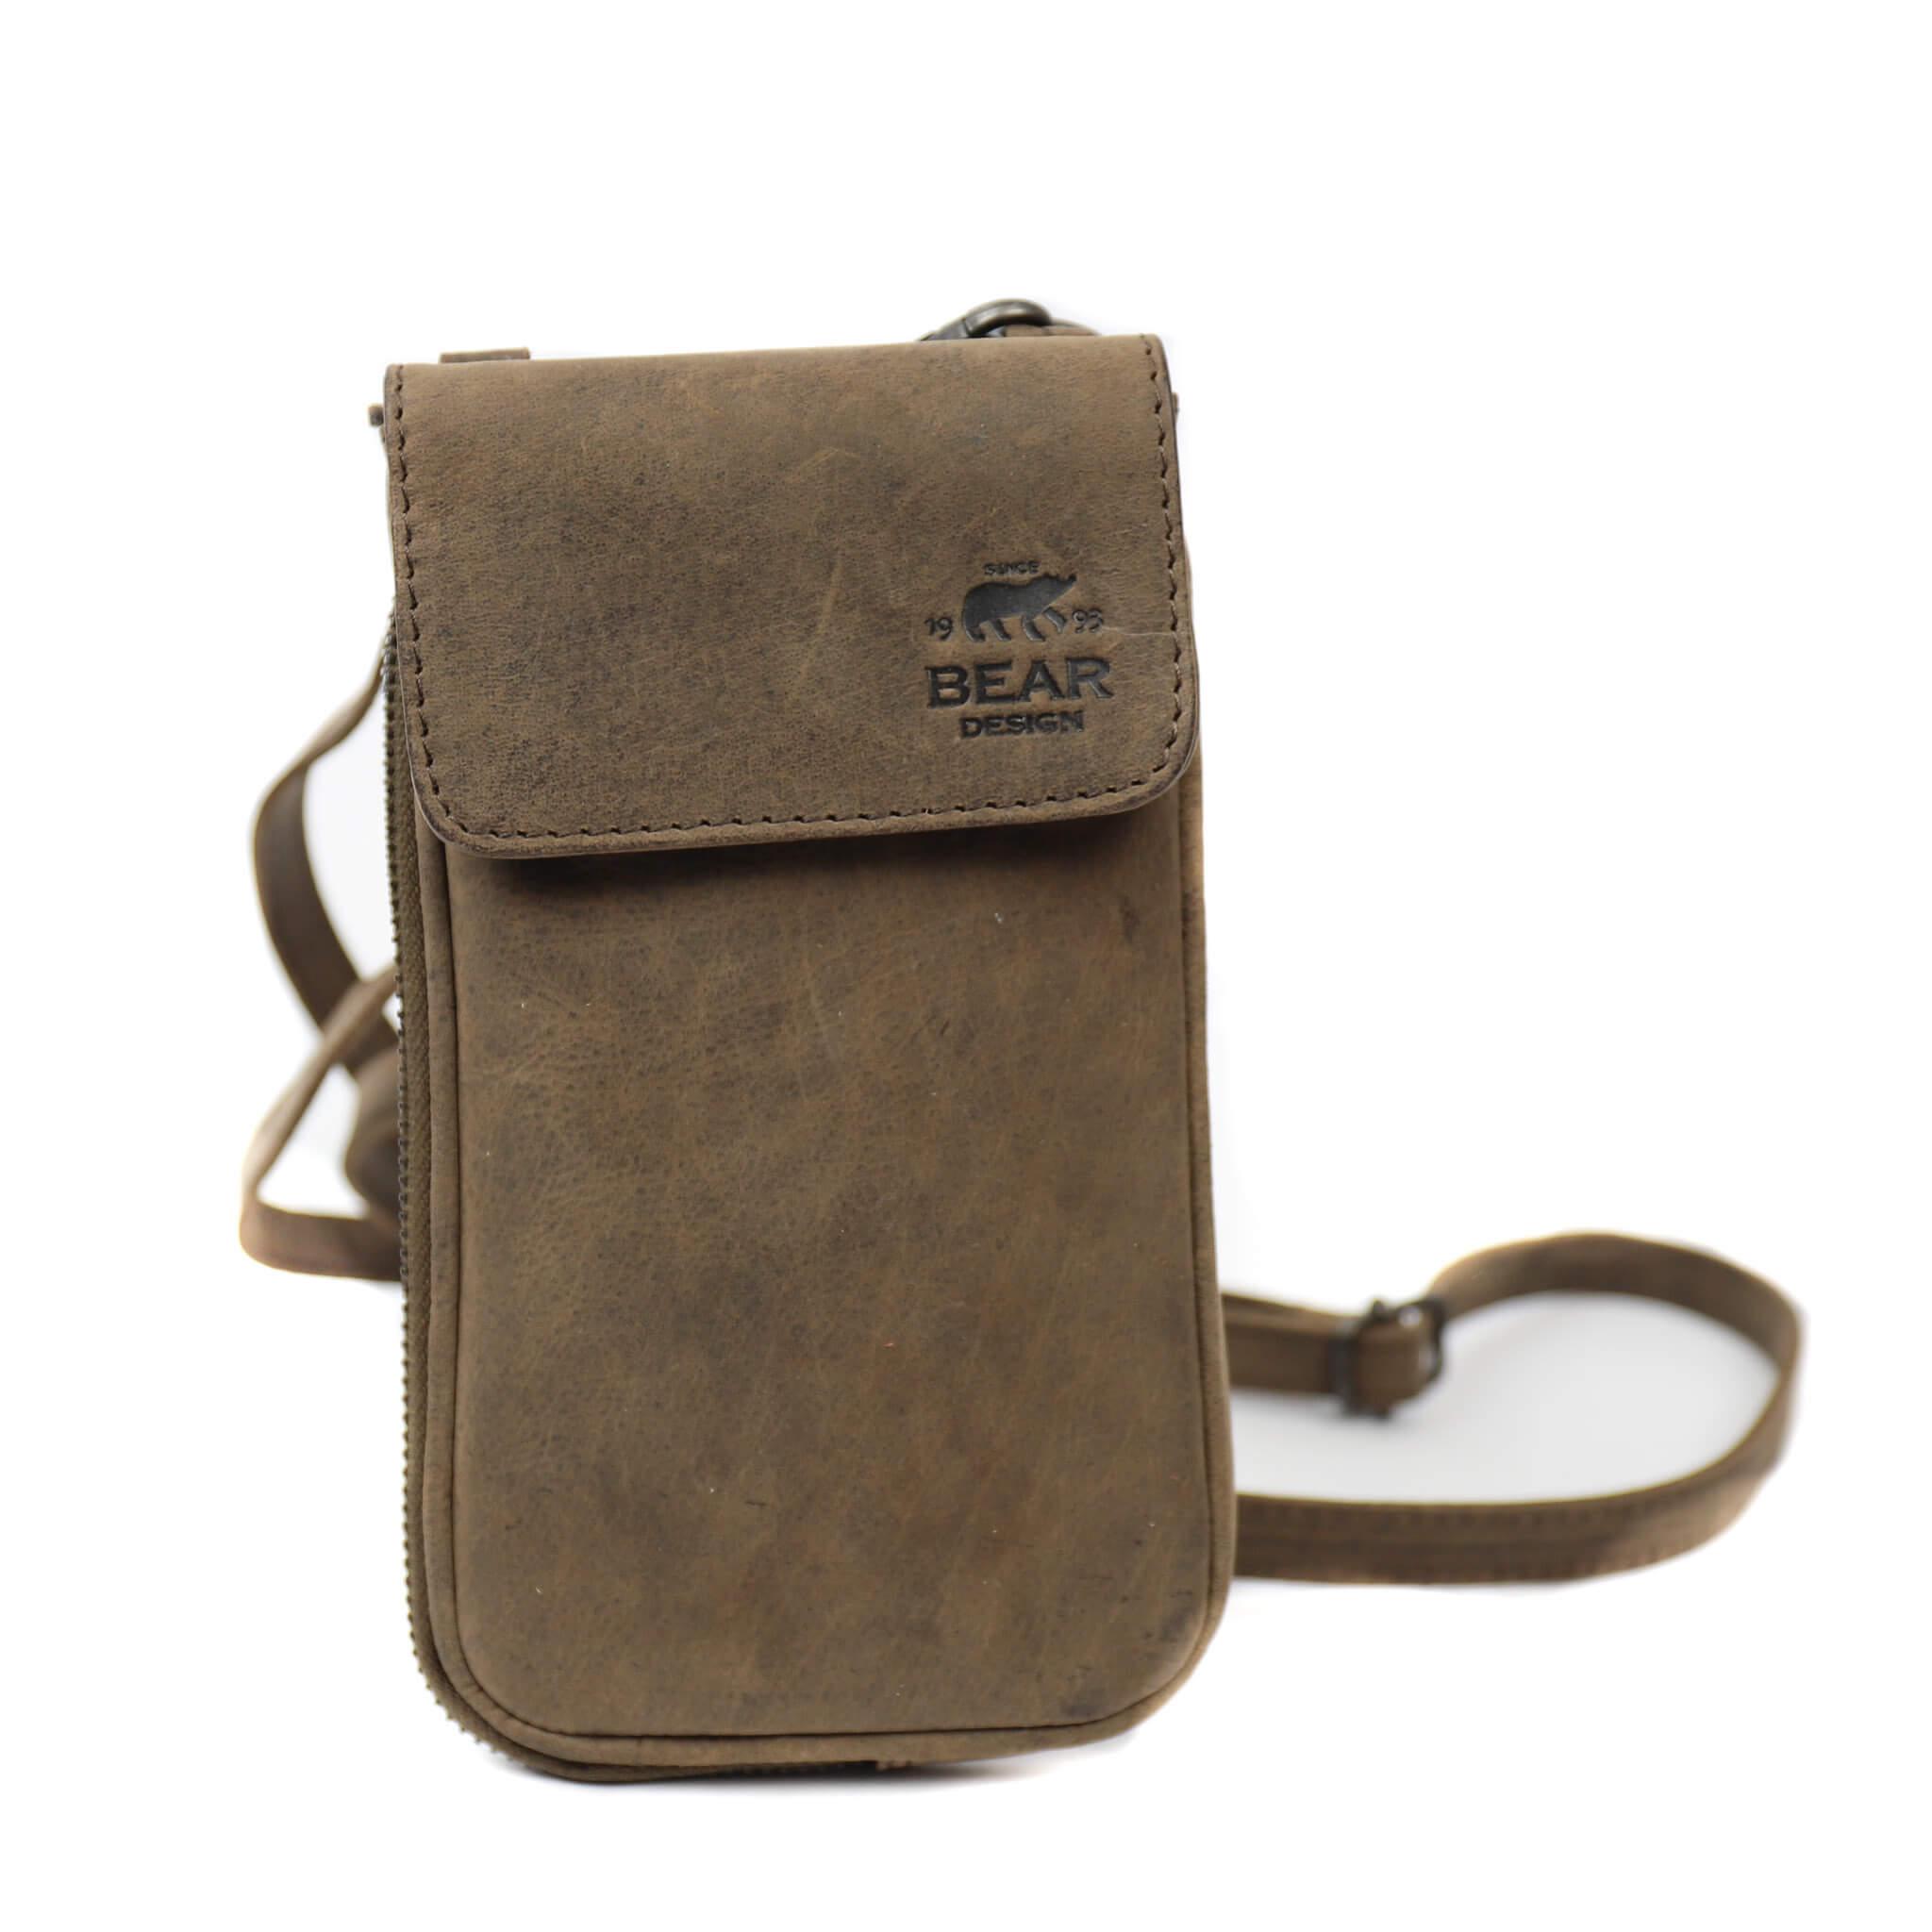 Bear Design Phone Bag Ahana Telefoontasje Donker Bruin